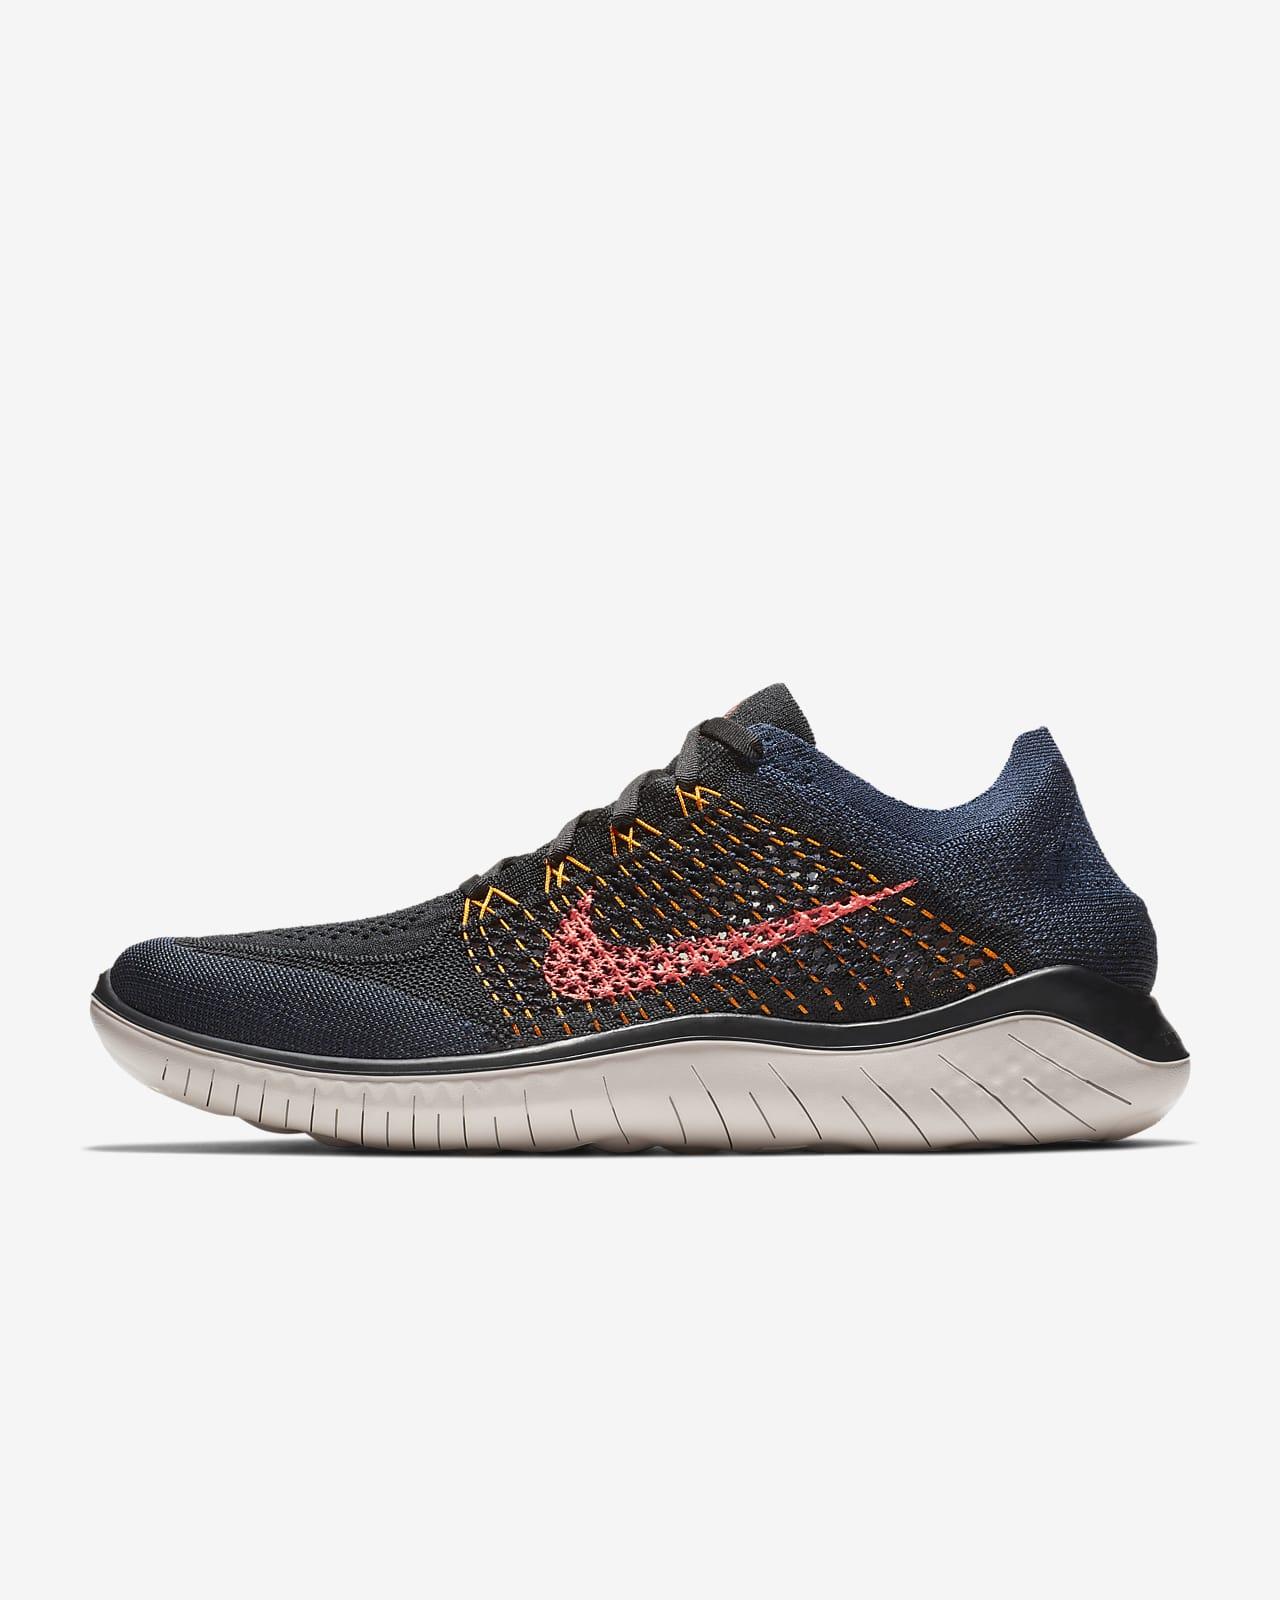 Calzado de running para hombre Nike Free RN Flyknit 2018